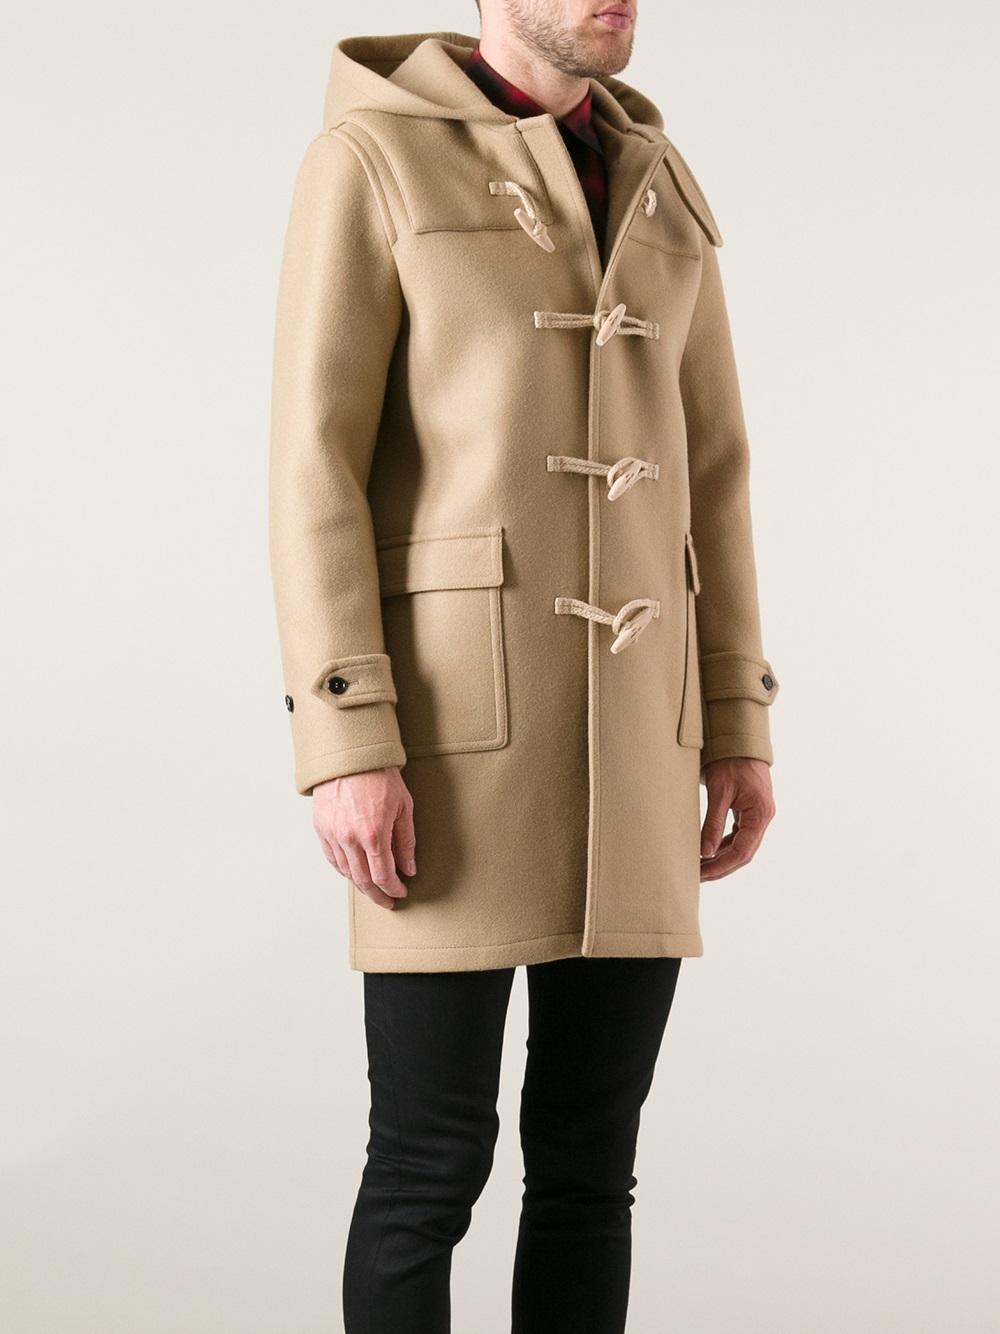 Lyst - Saint Laurent Classic Duffle Coat In Natural For Men-2940